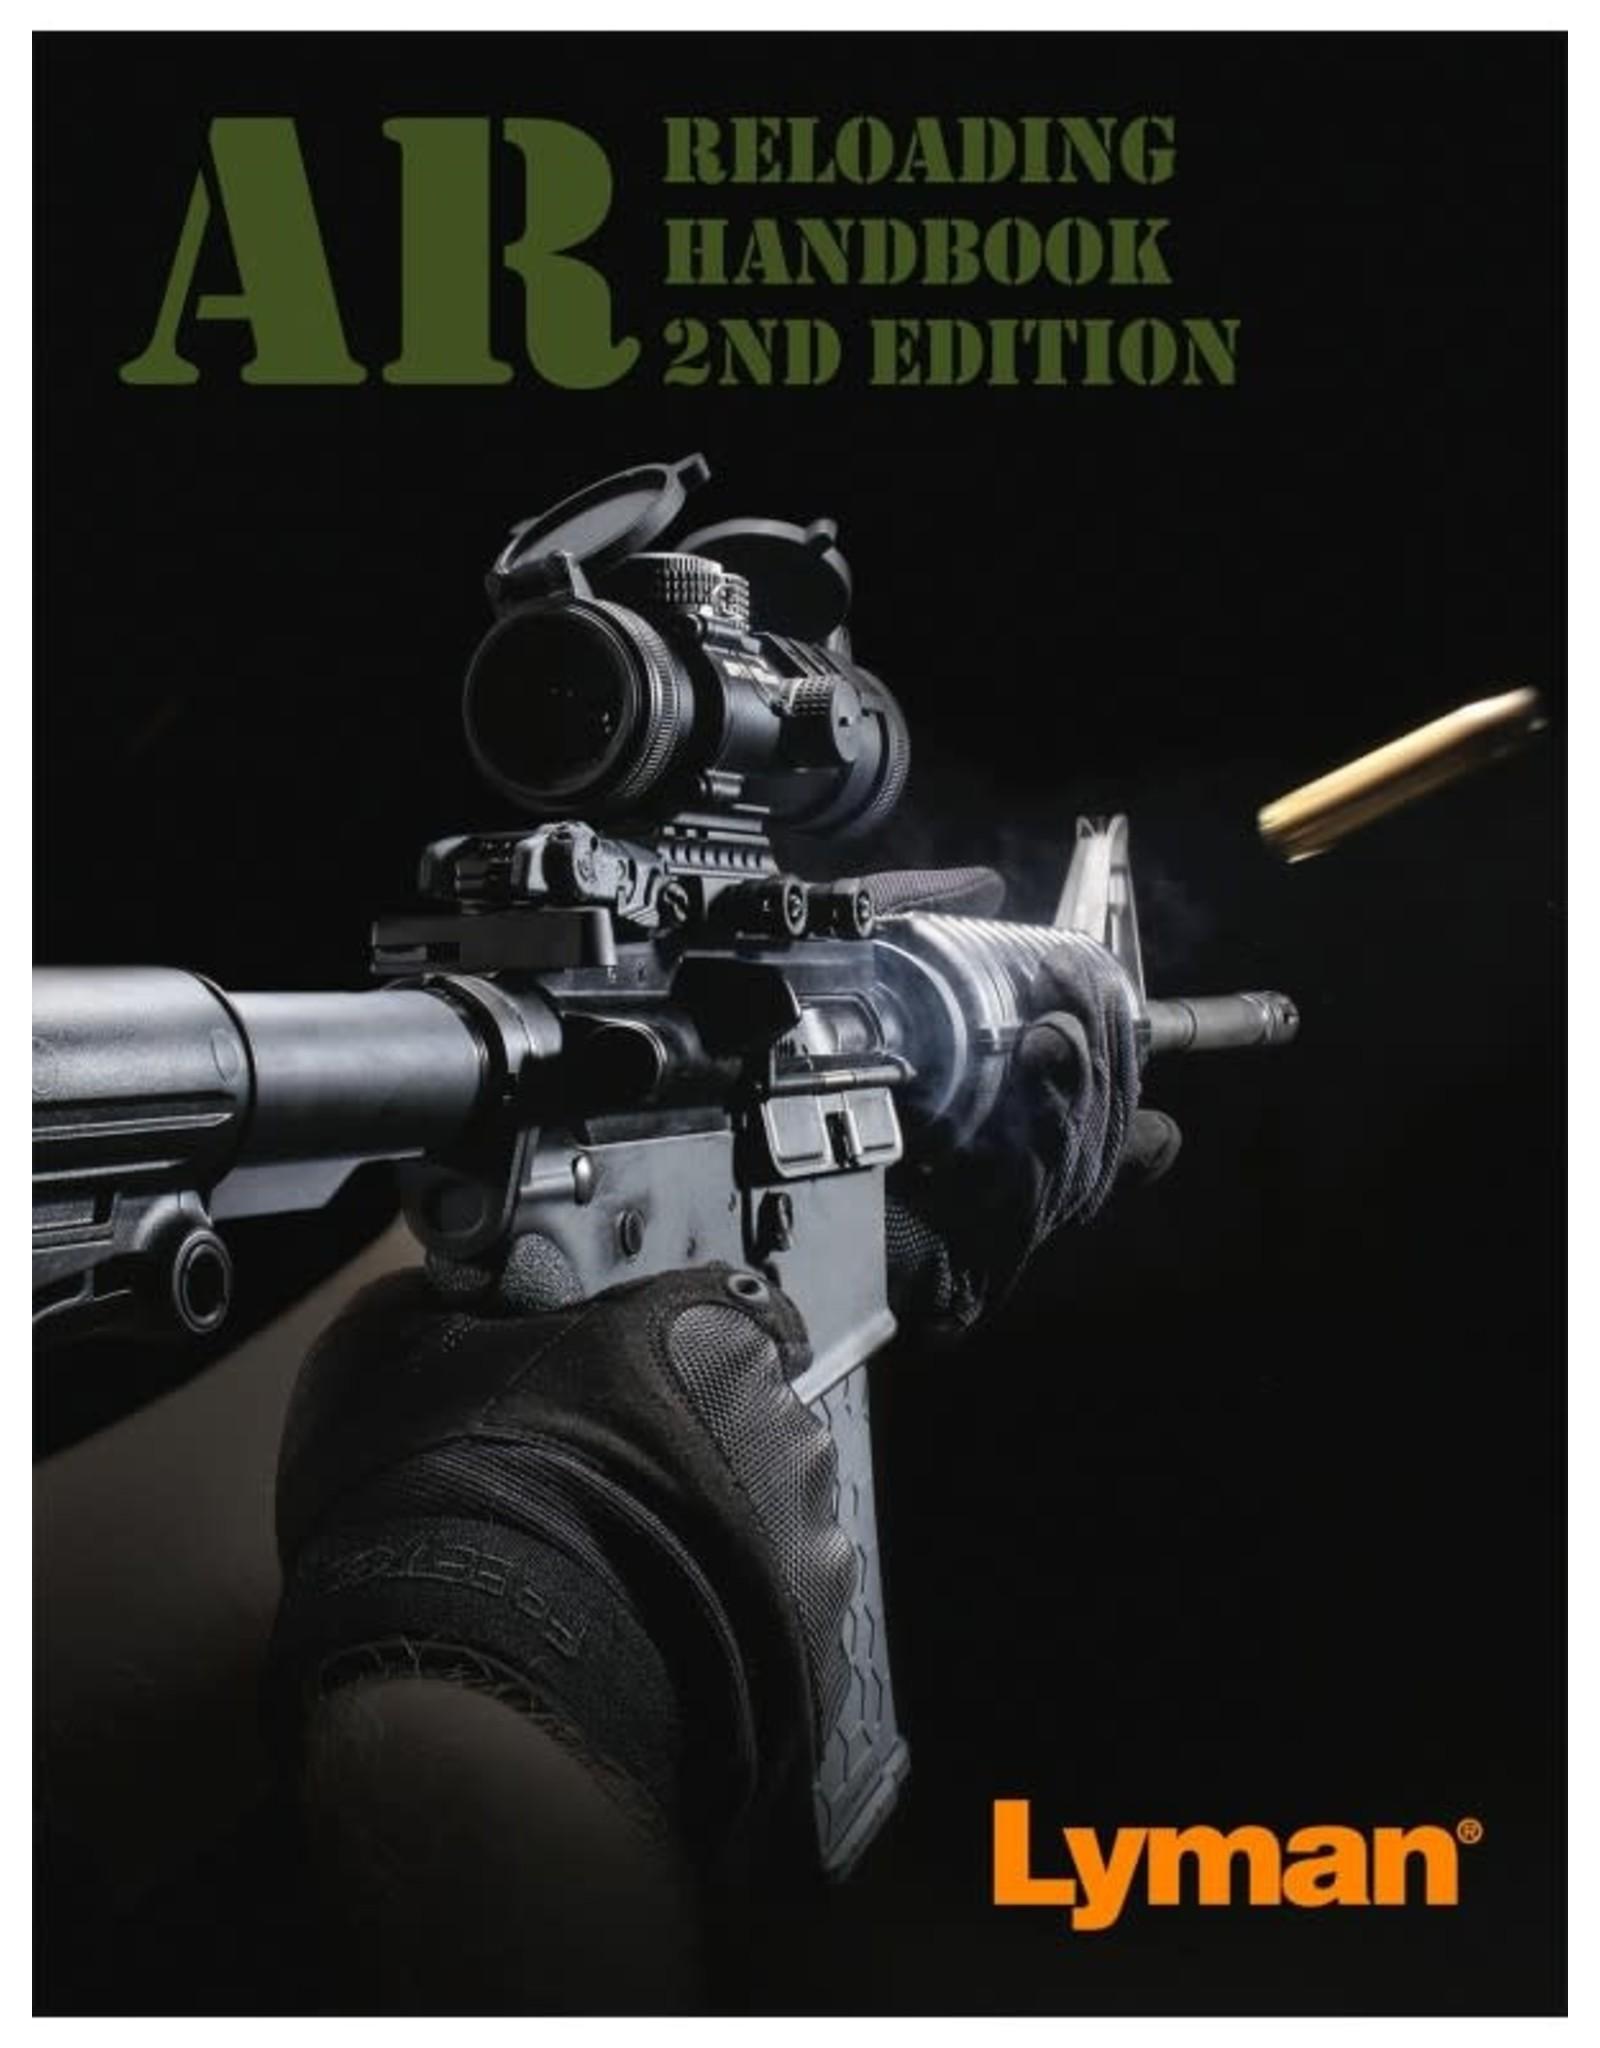 Lyman Lyman AR Reloading Handbook - 2nd Edition